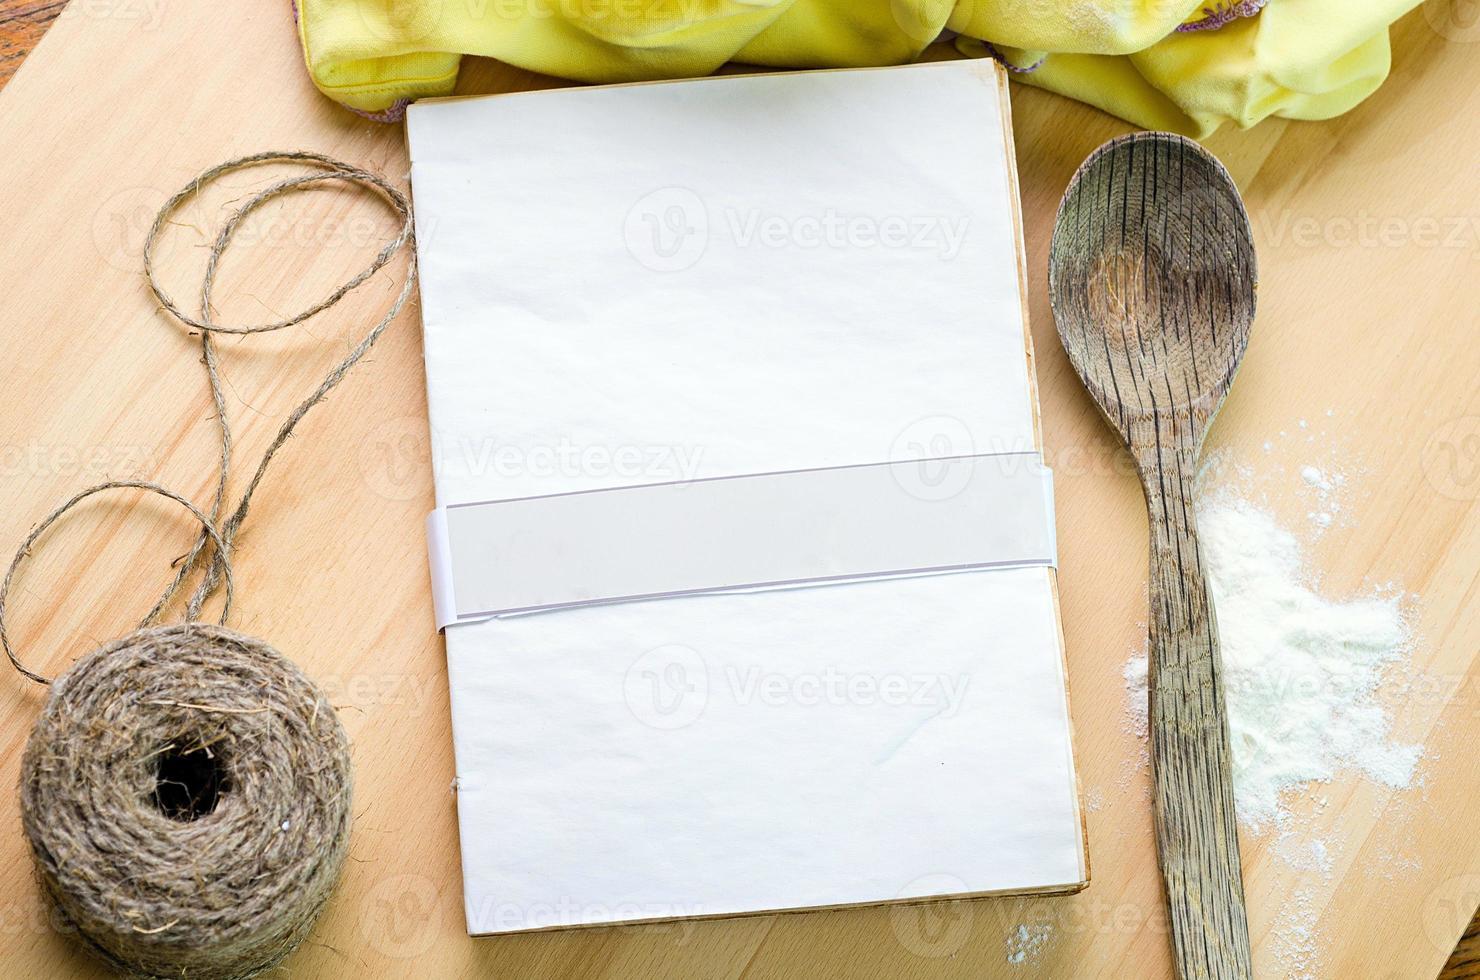 tom kokbok på trä skrivbord foto